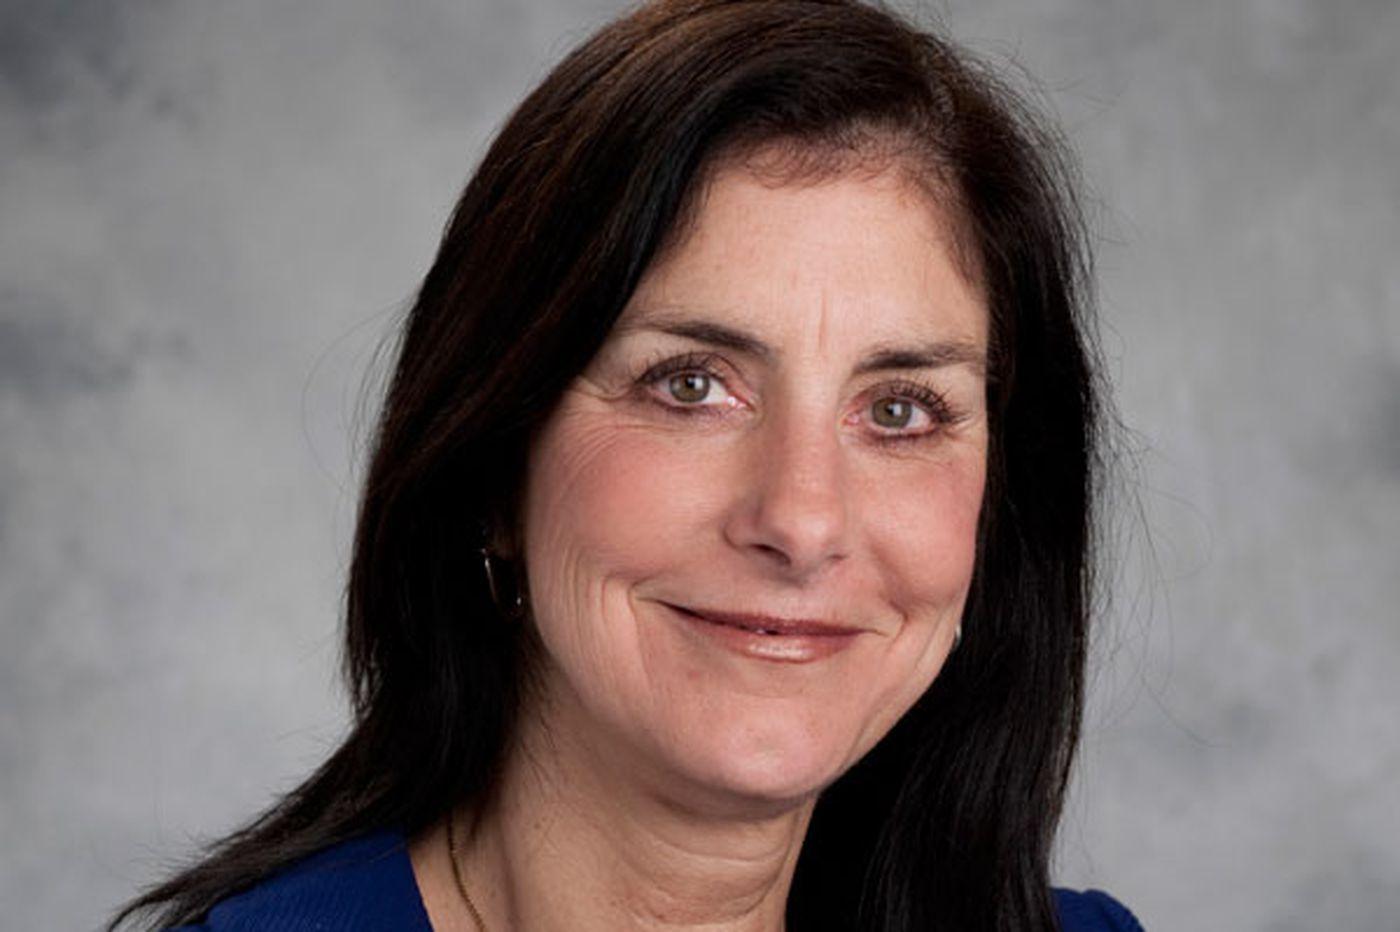 3B Orthopaedics moves to Aria Health from Pennsylvania Hospital